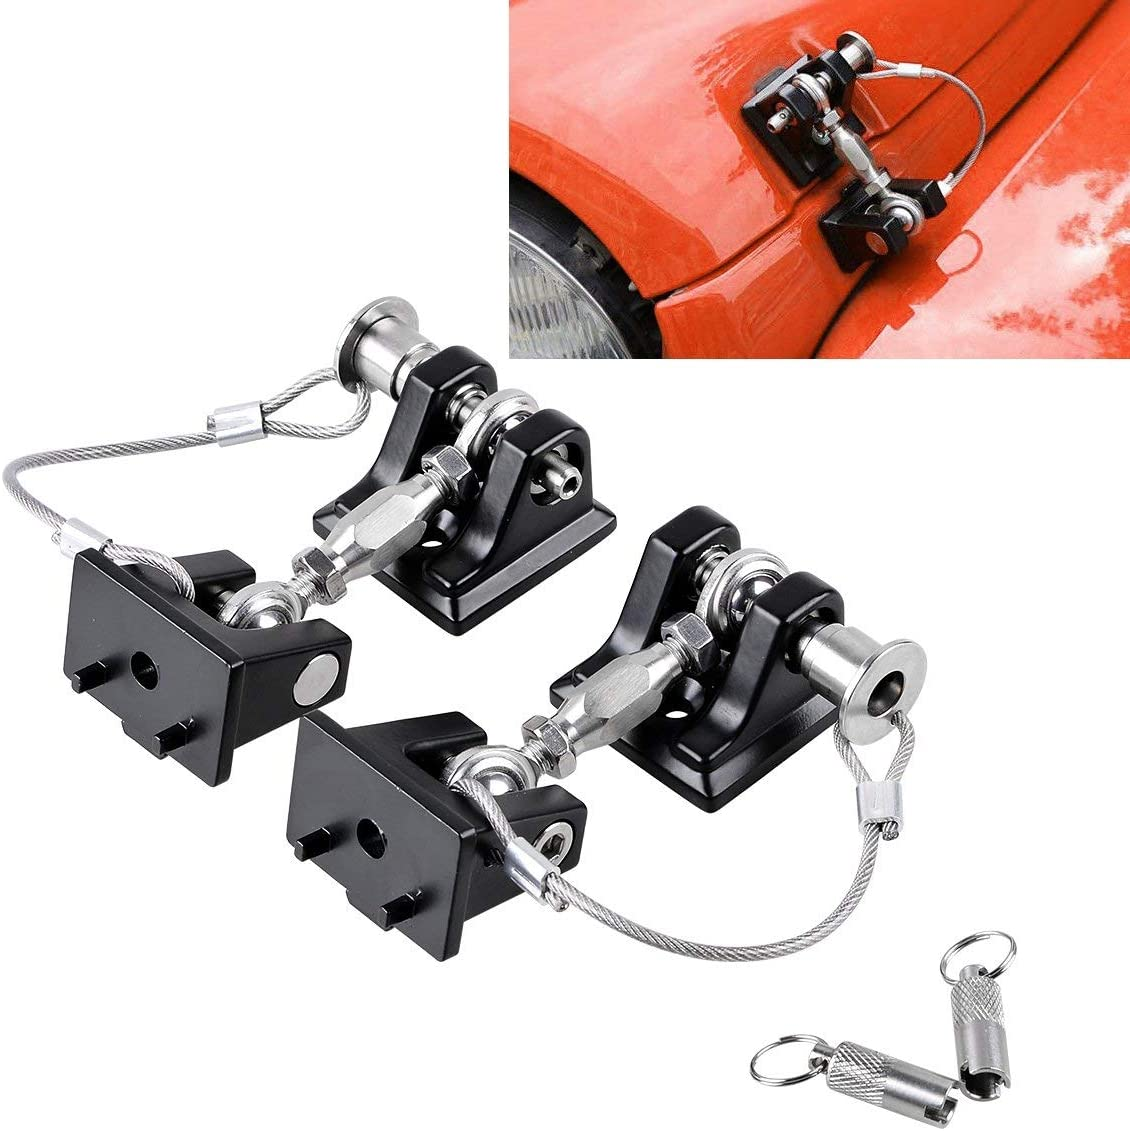 Pandaorv Hood Lock Anti Theft Front Grille Lock with Keys for Jeep Wrangler JK 2007-2018